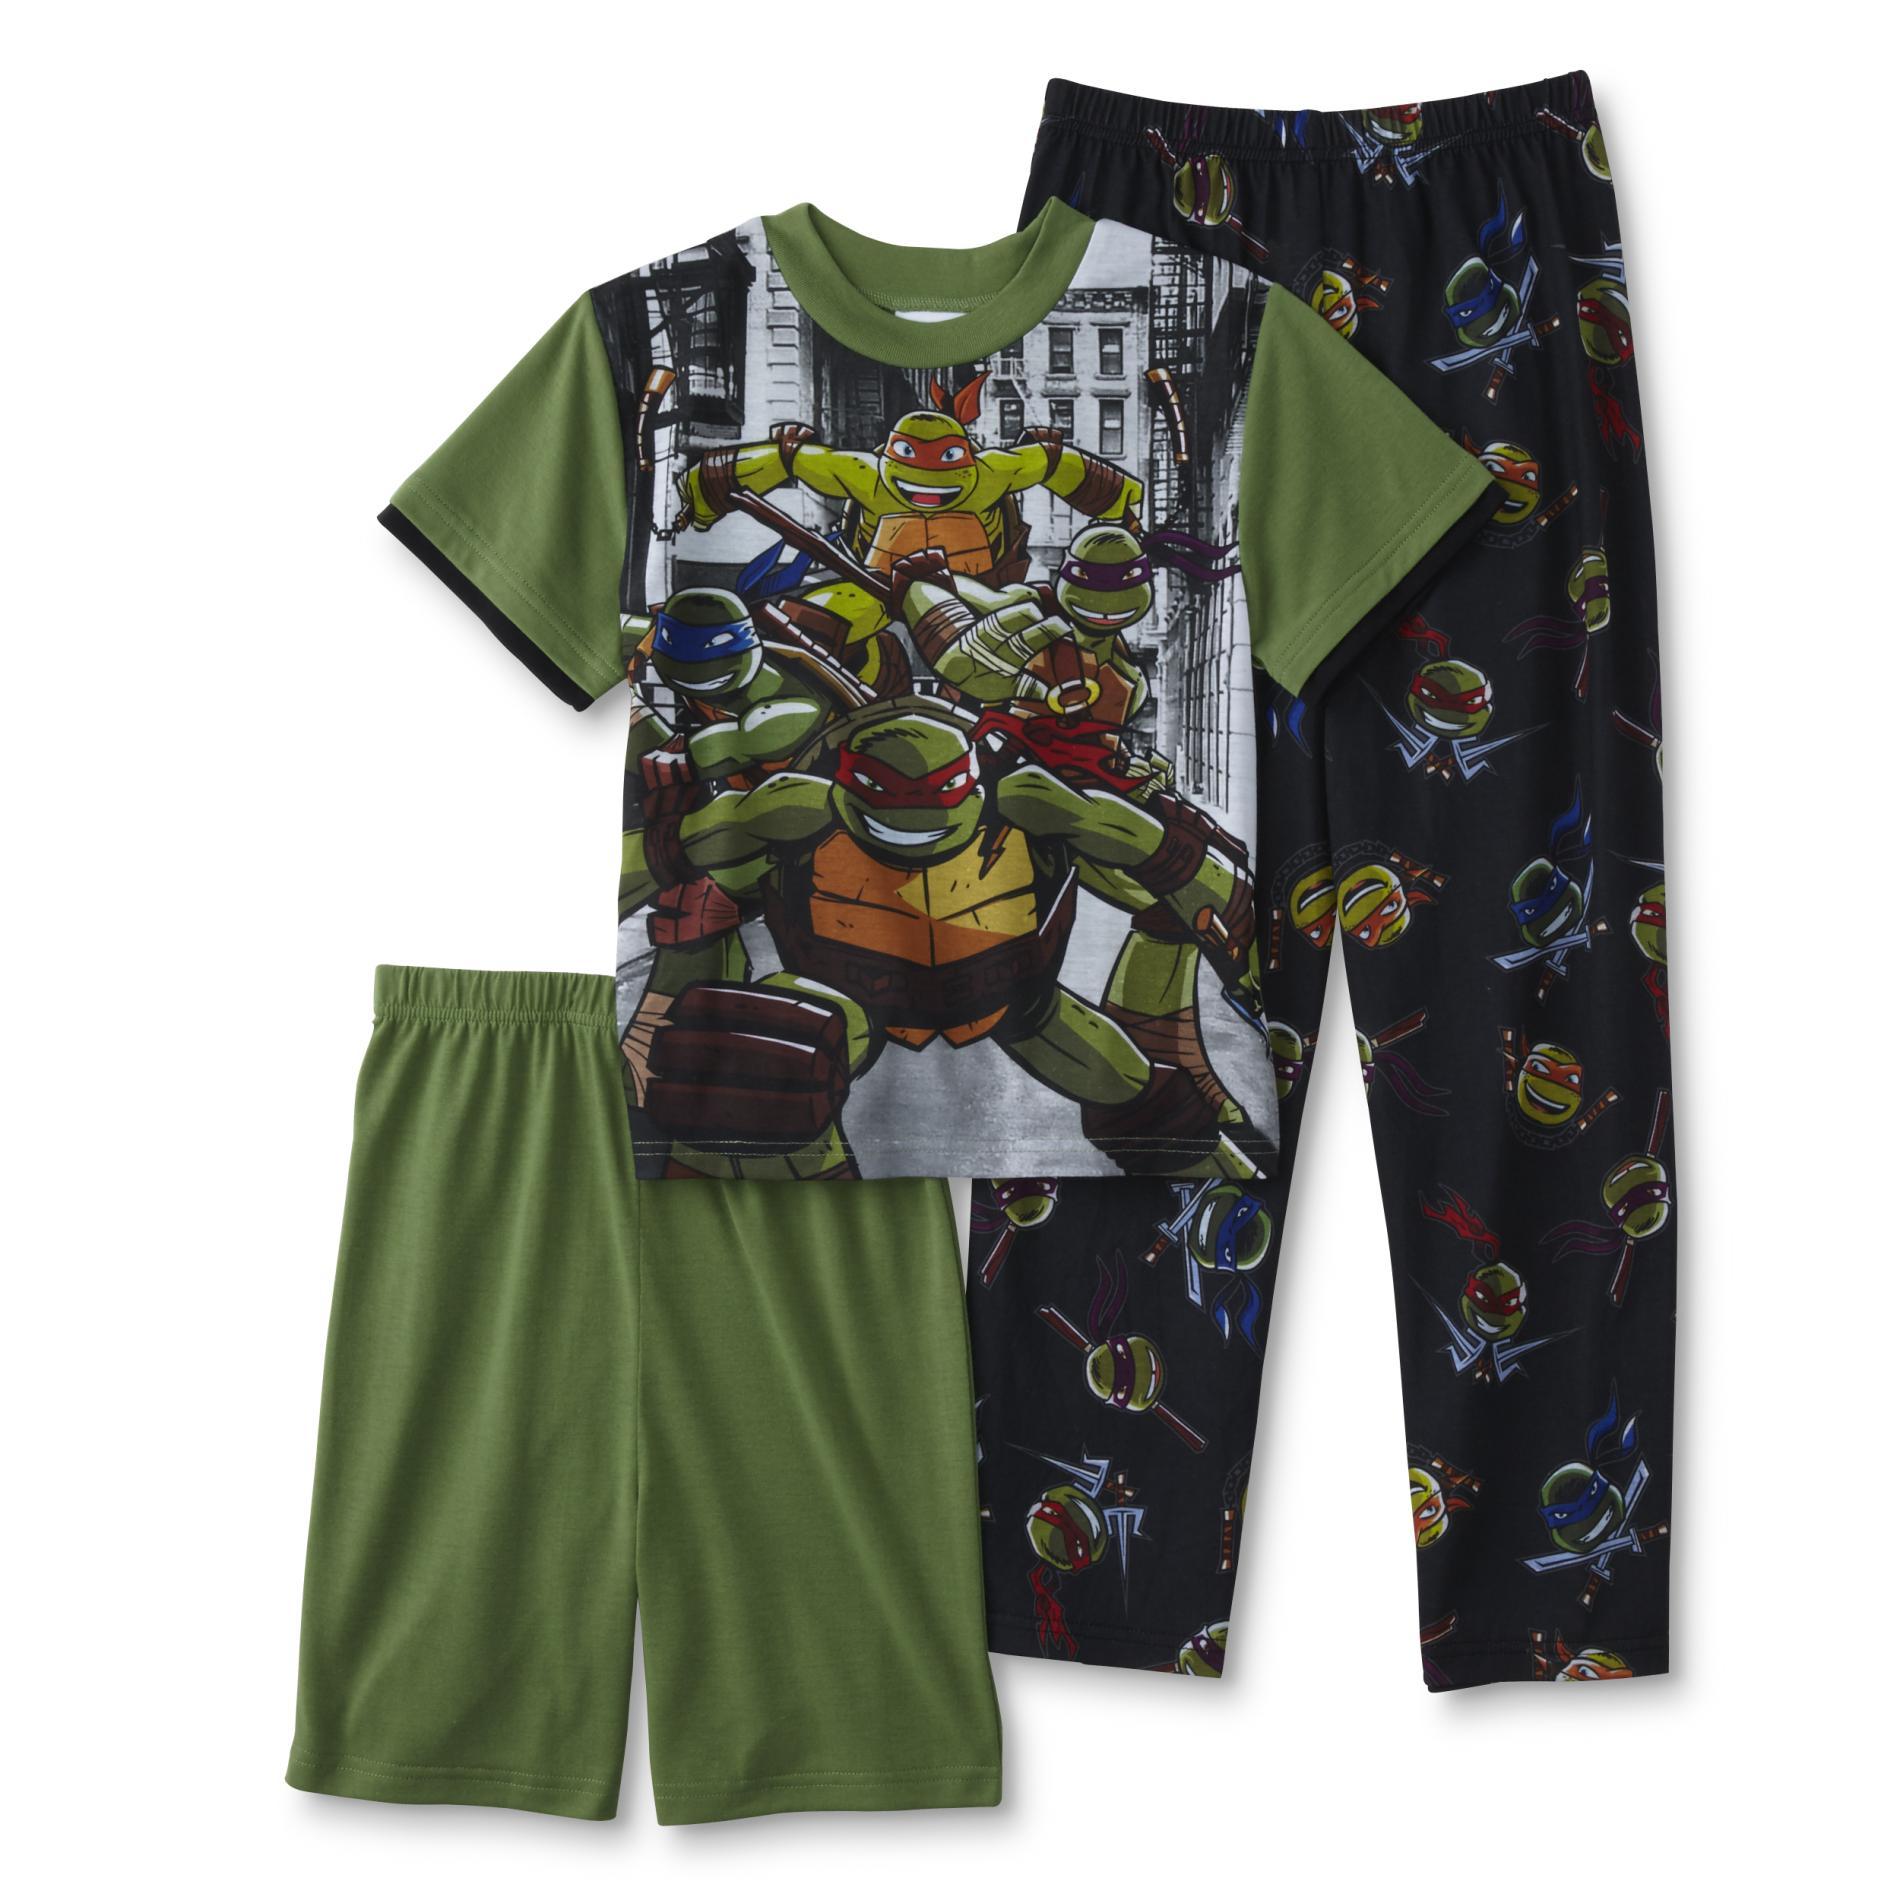 Teenage Mutant Ninja Turtles Boys Pajama T Shirt Shorts